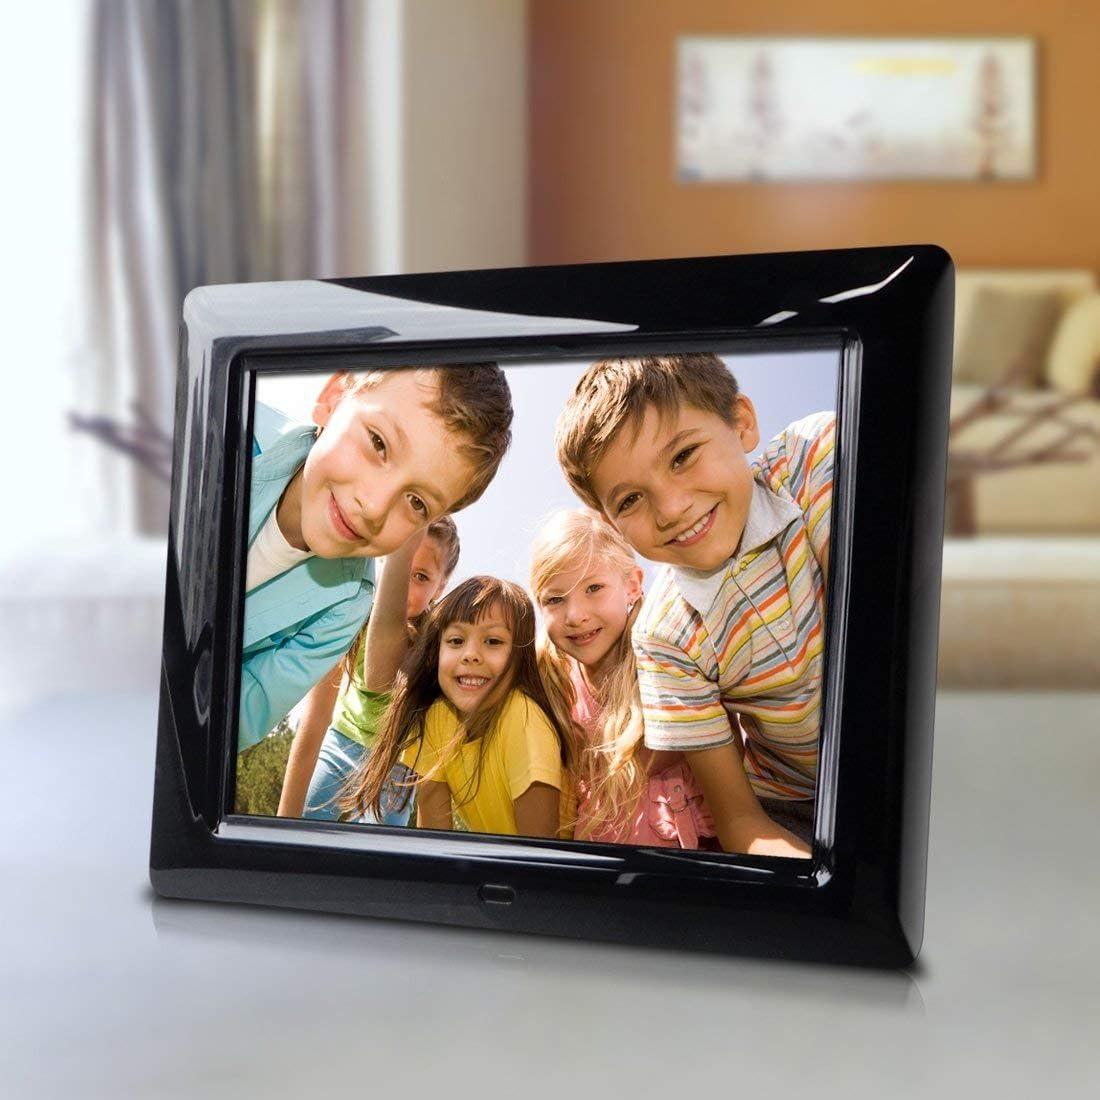 Interval time Adjust Hi-Resolution slideshow Transitional Effects 8 Inch Digital Photo Frame Great Gift